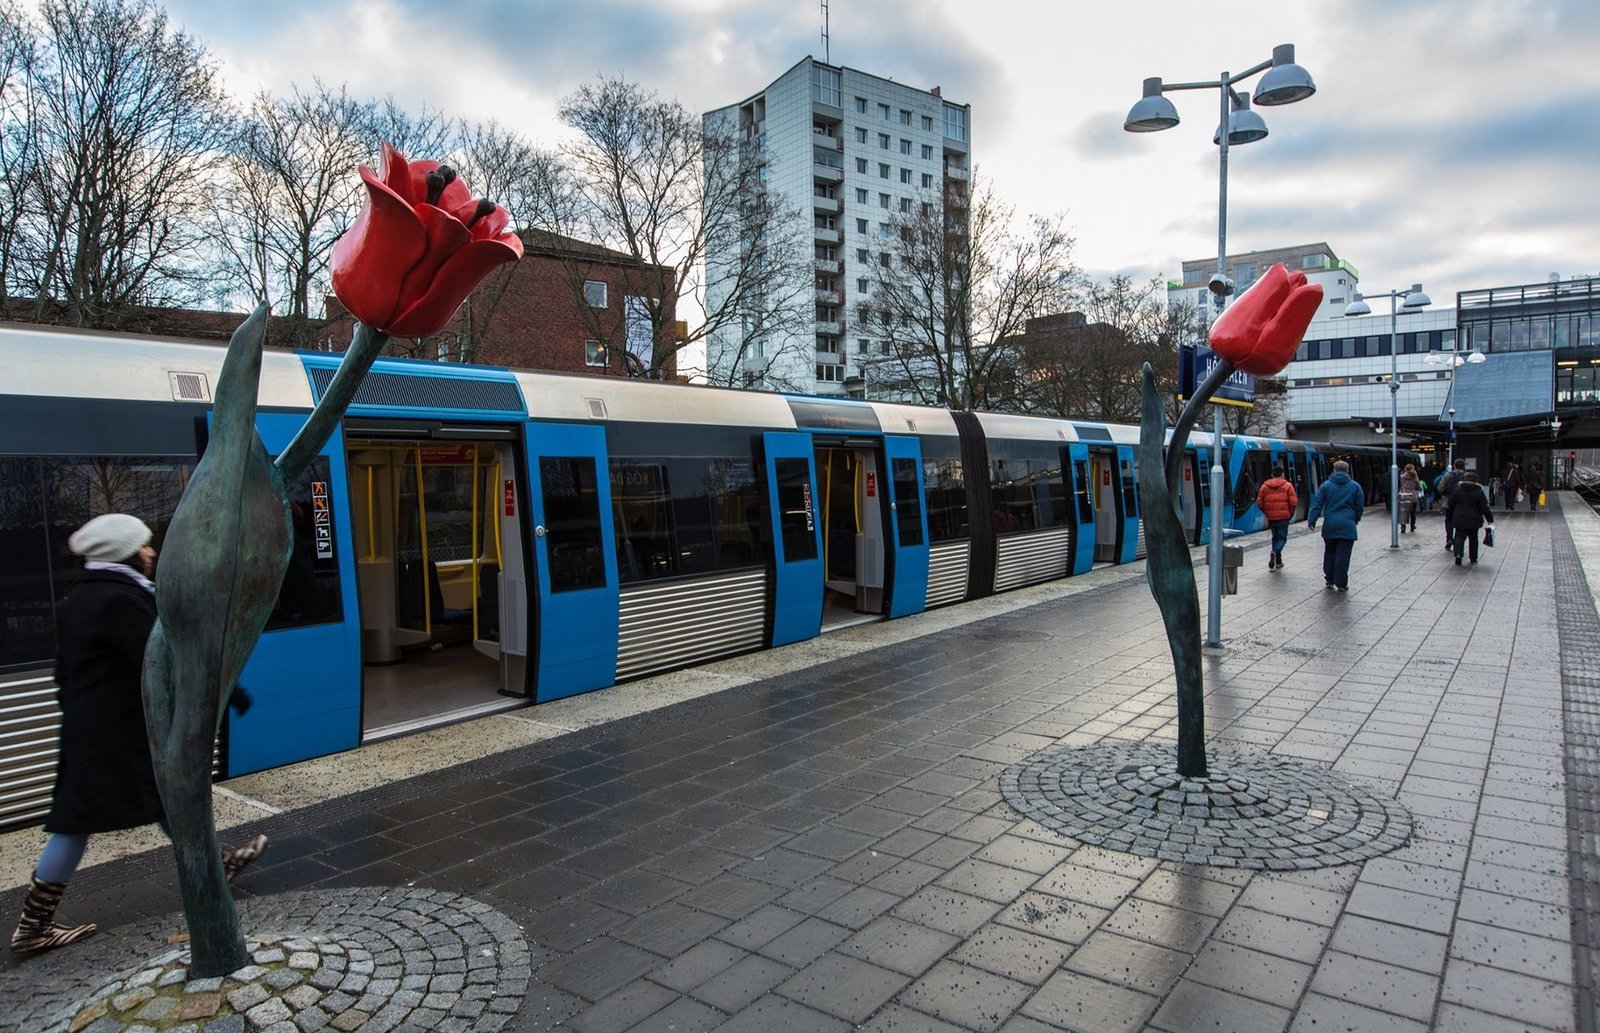 Photo 9 of 10 in Explore the Stockholm Metro For a Tour Through 5 Decades of European Art History